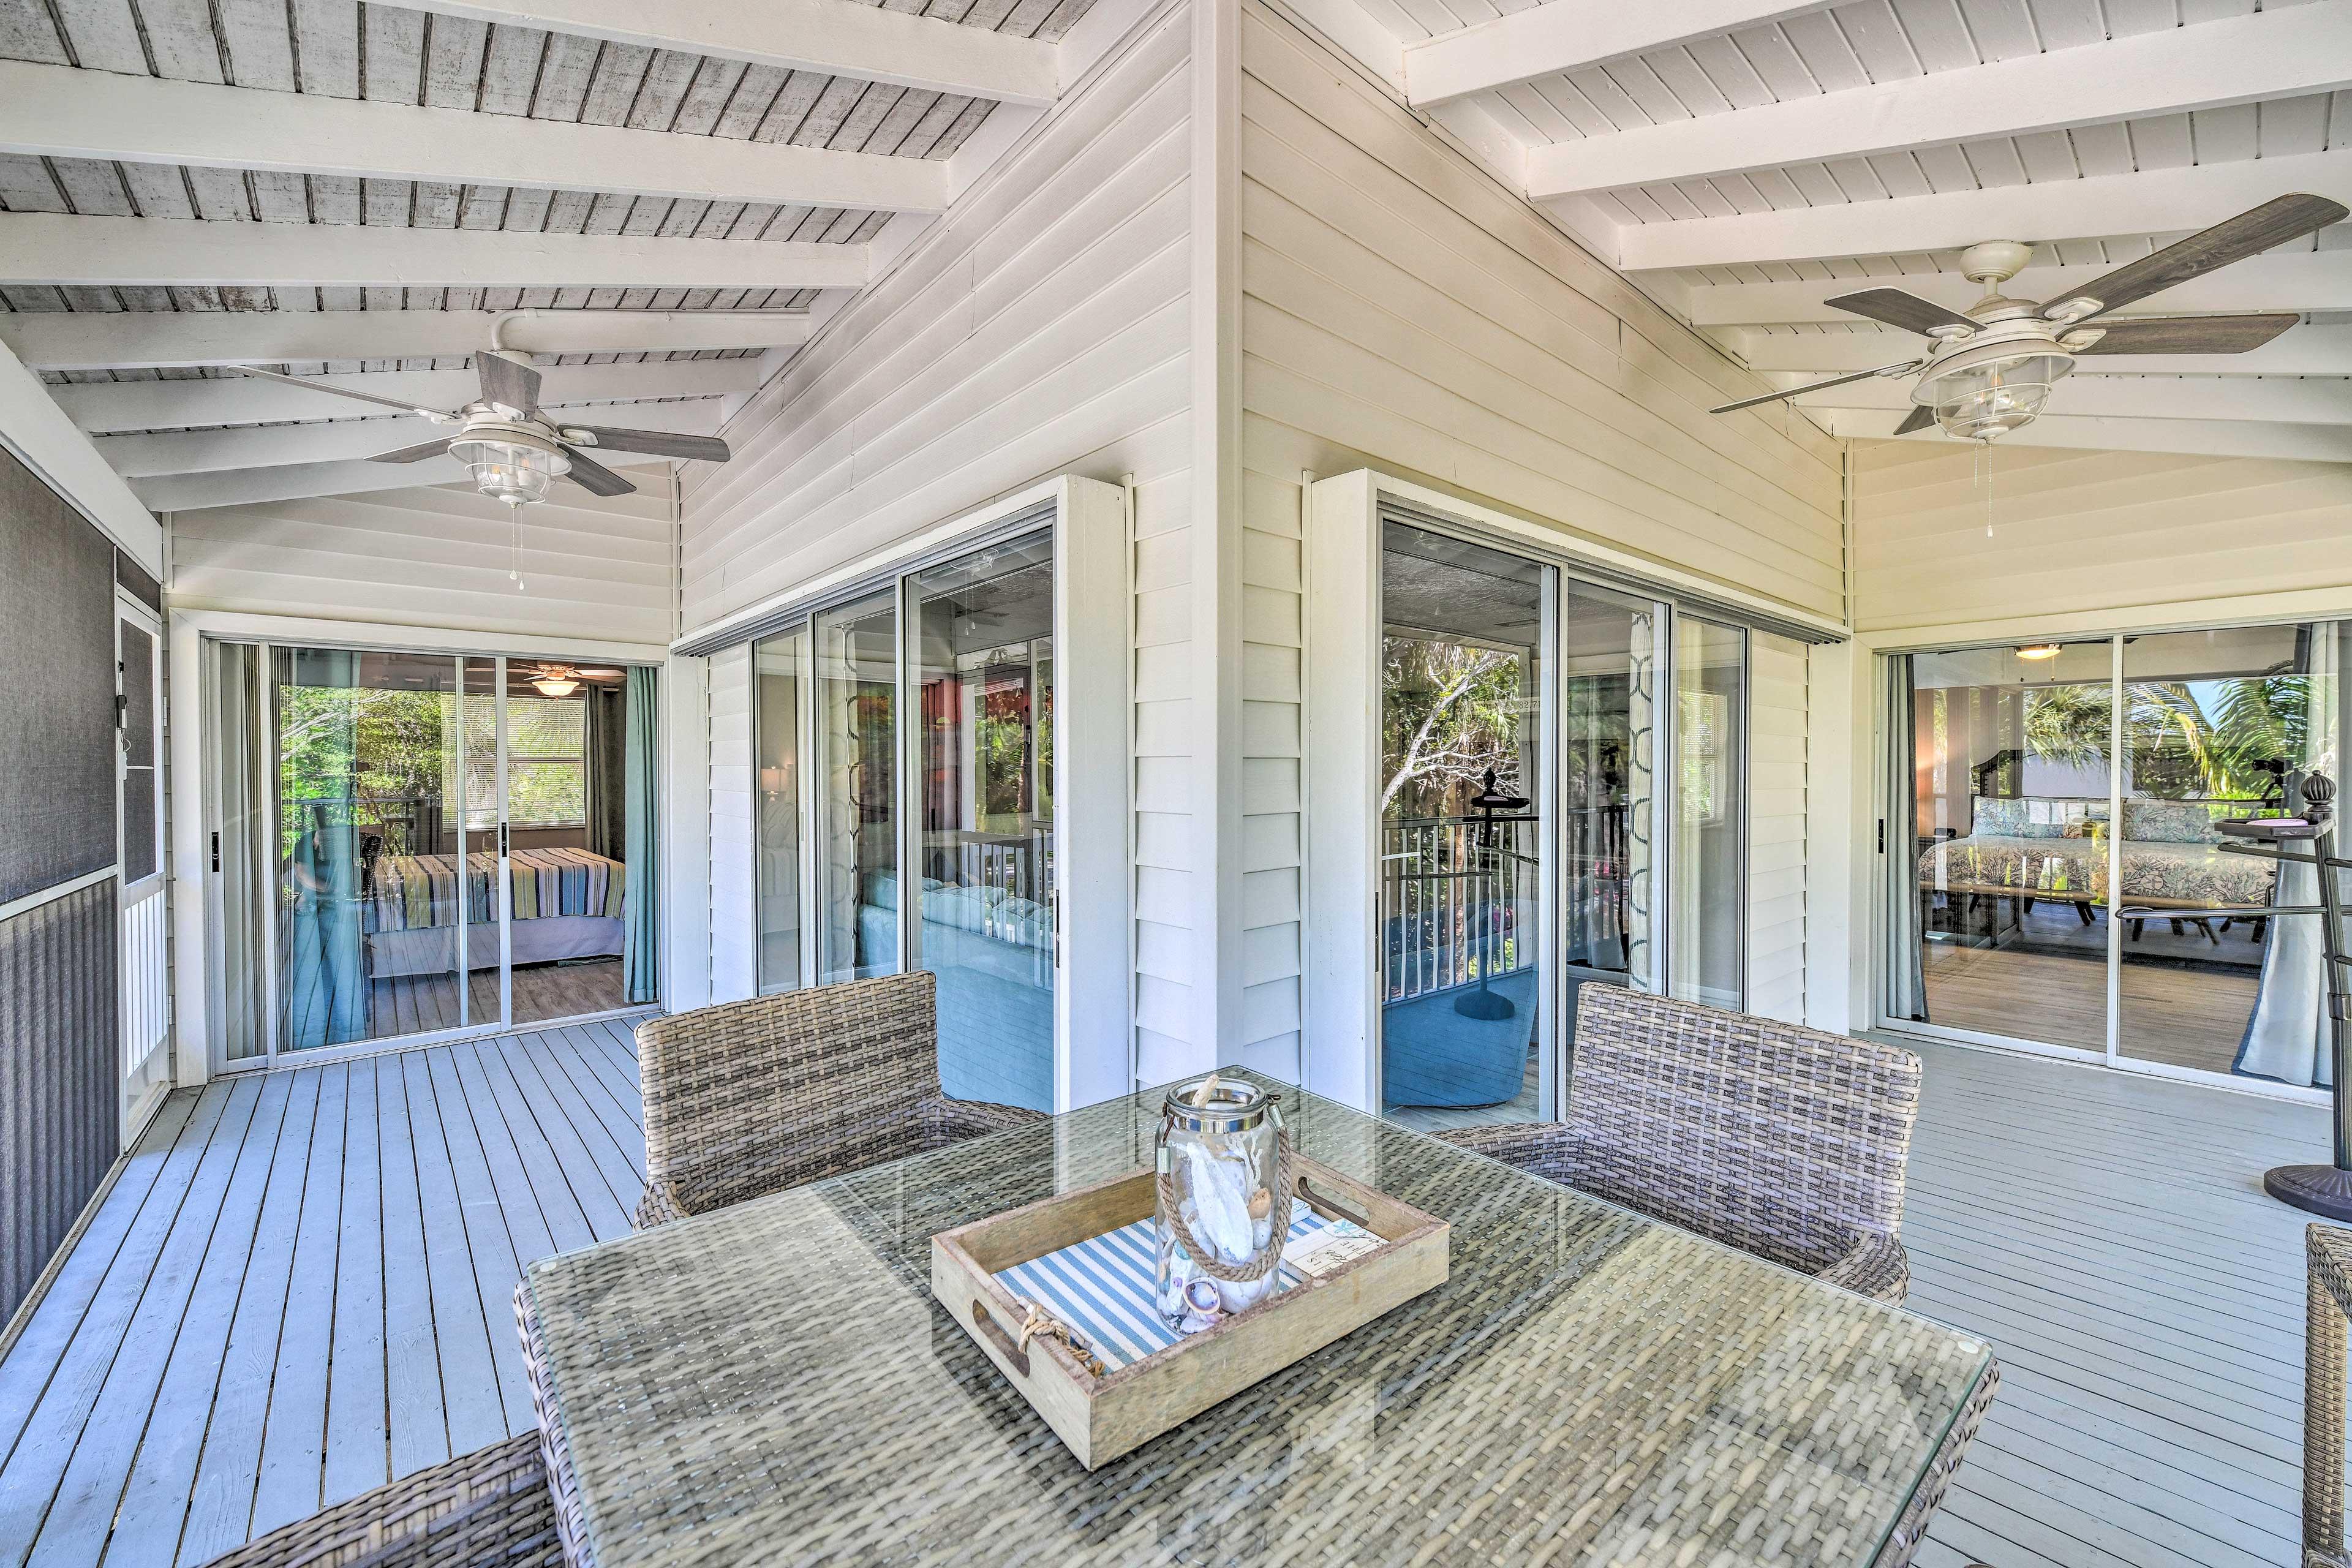 Private Screened-In Porch